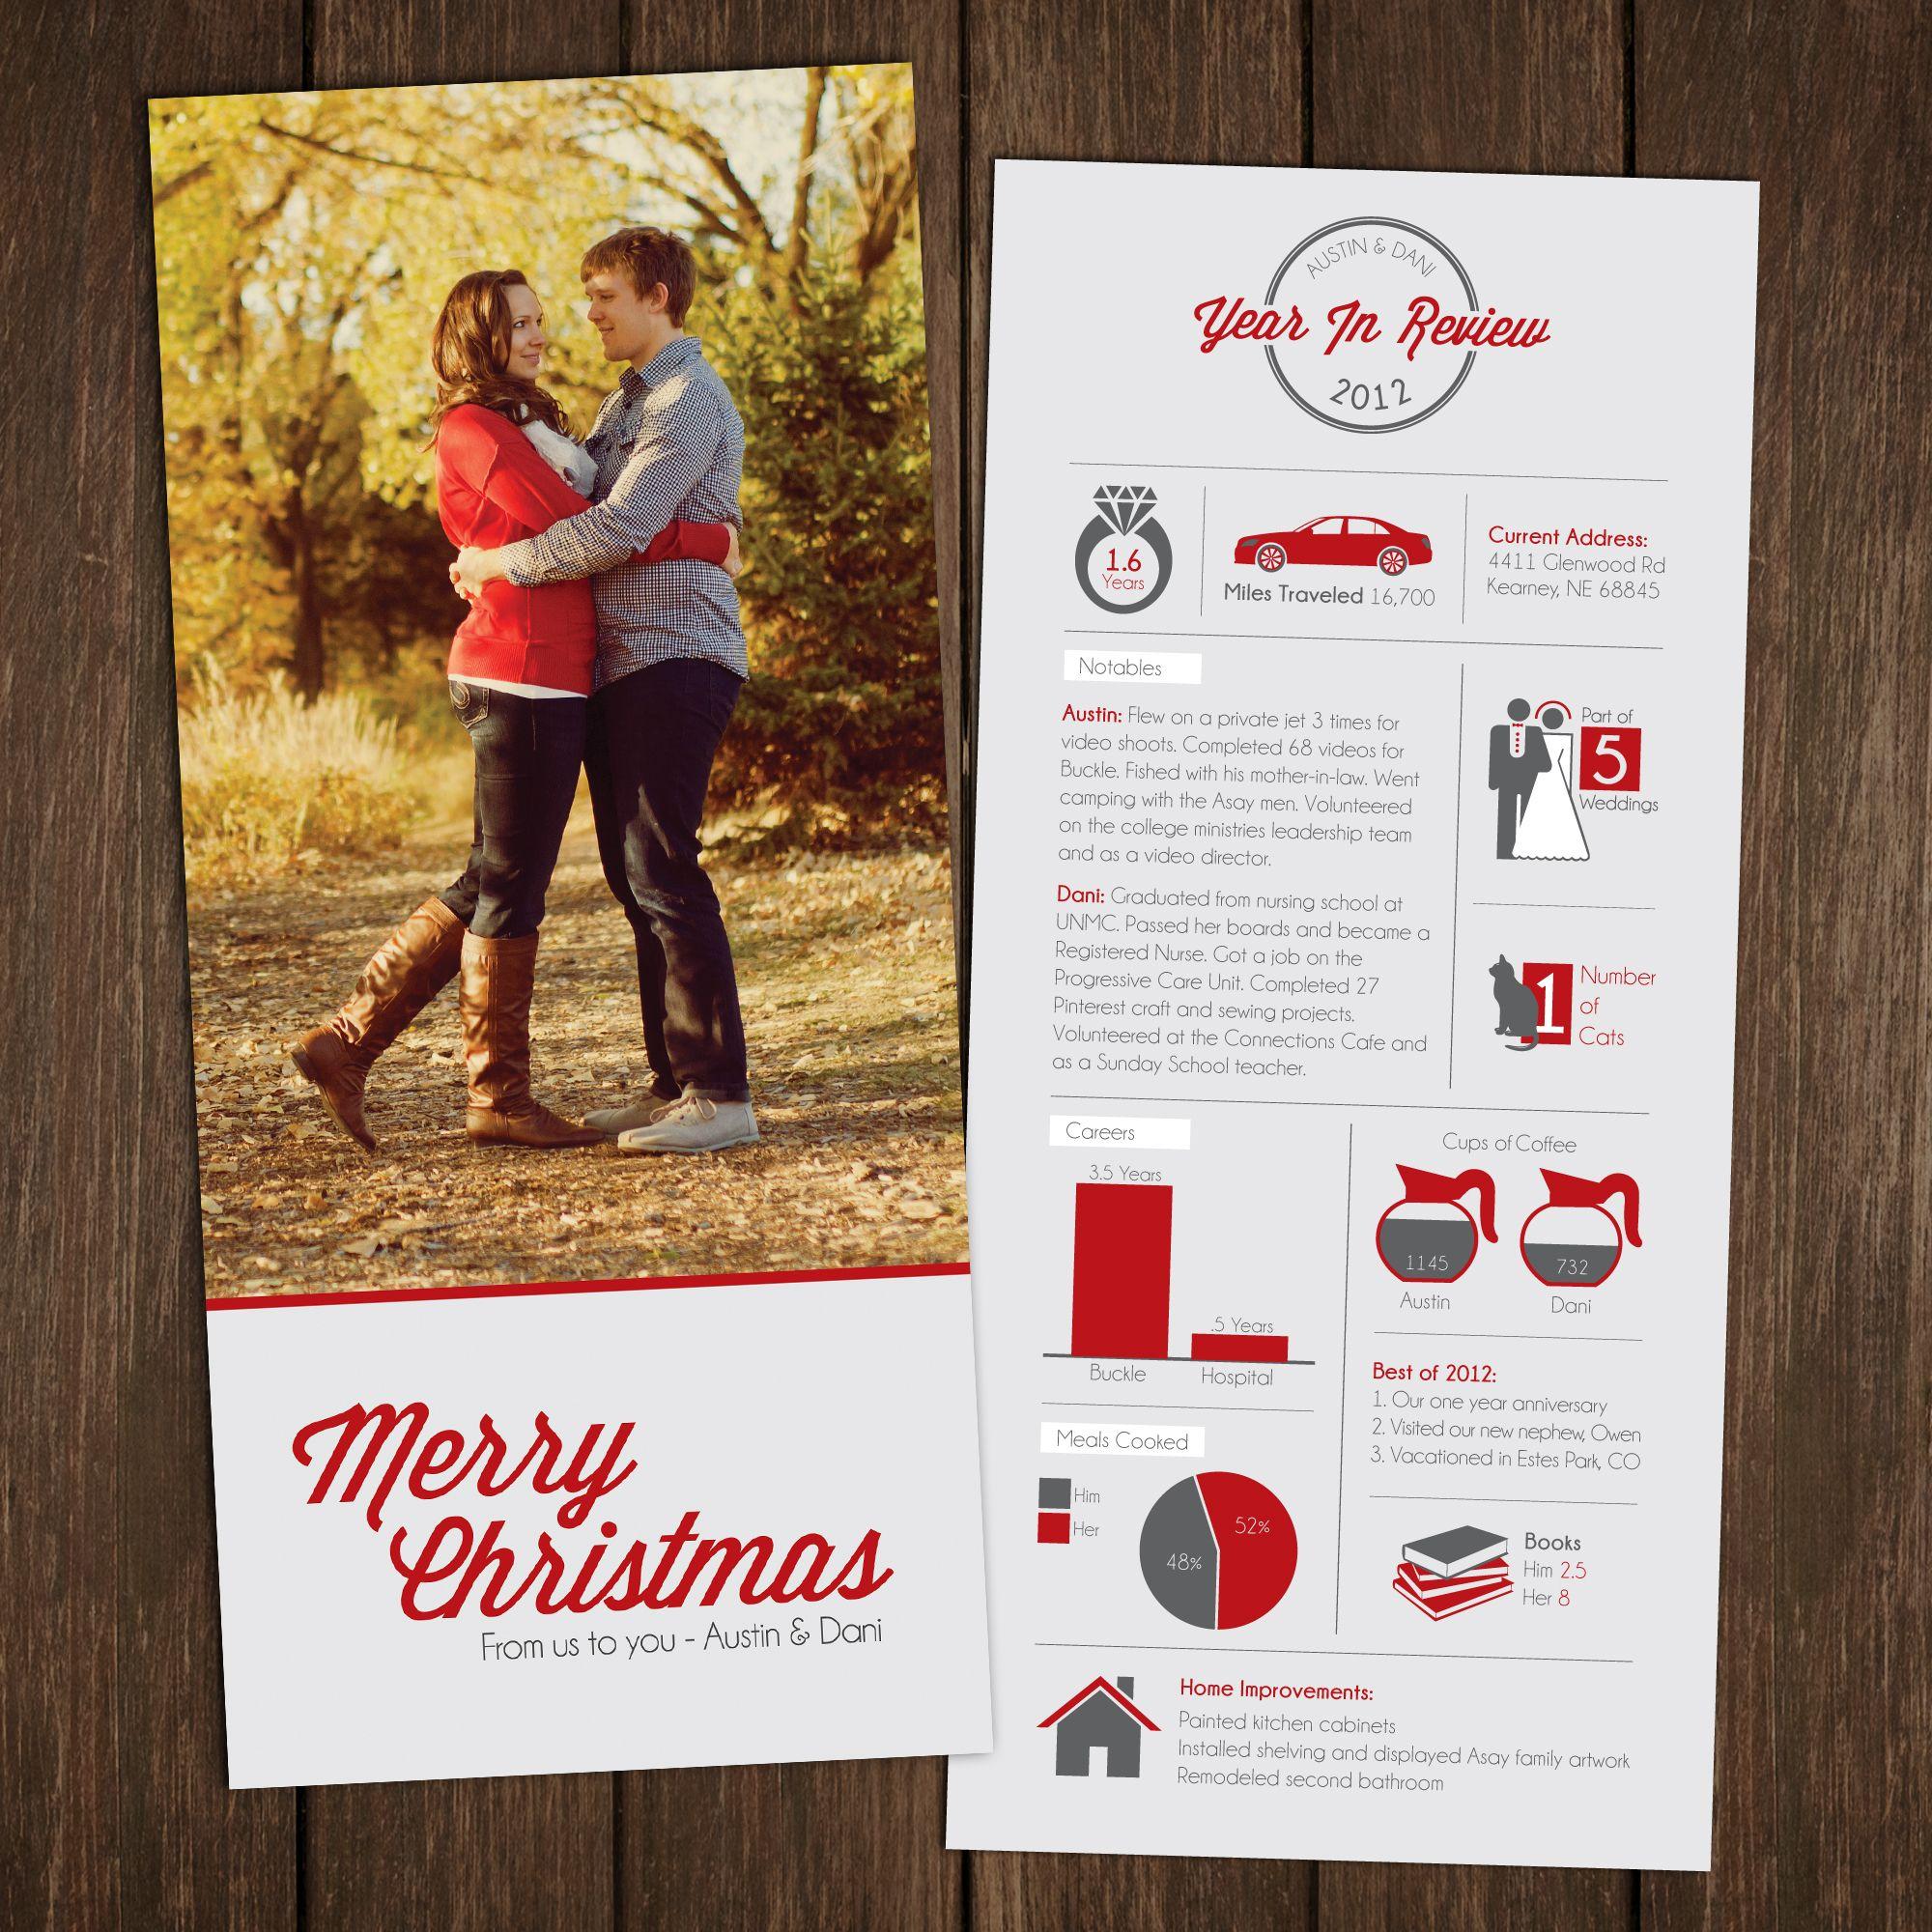 Asay Christmas Card 2012 Infographic